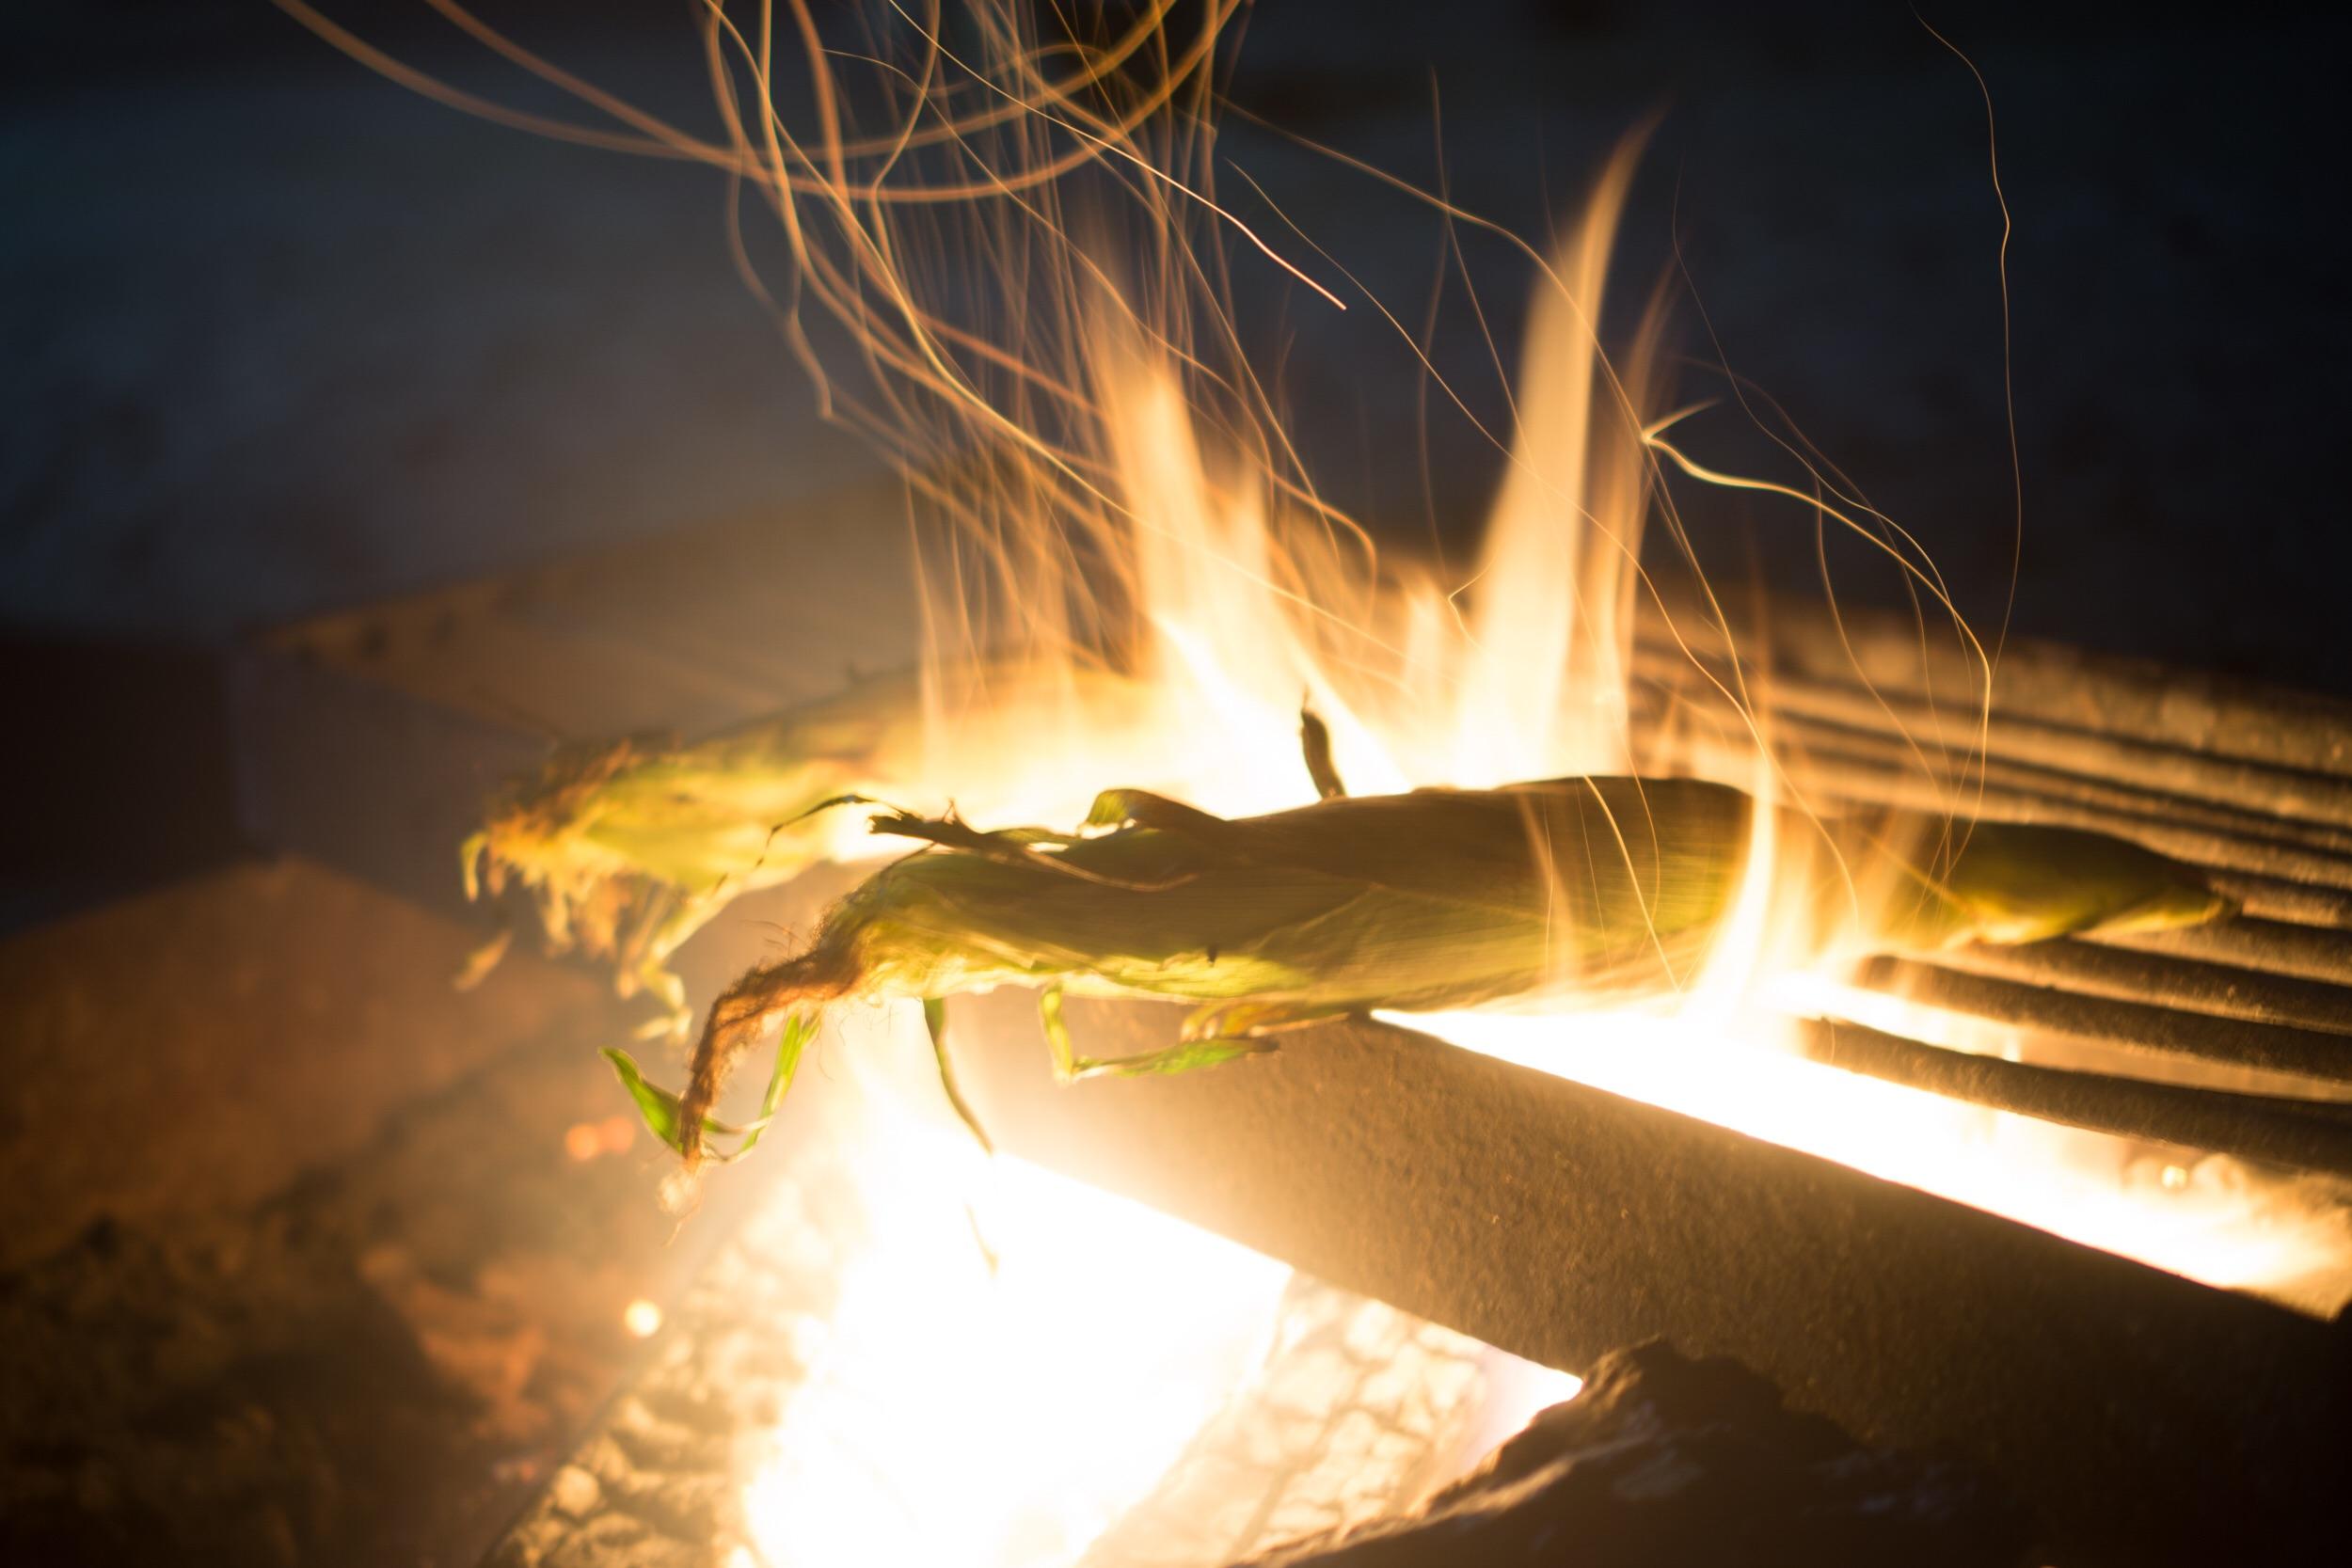 Campfire roasted corn. YUM